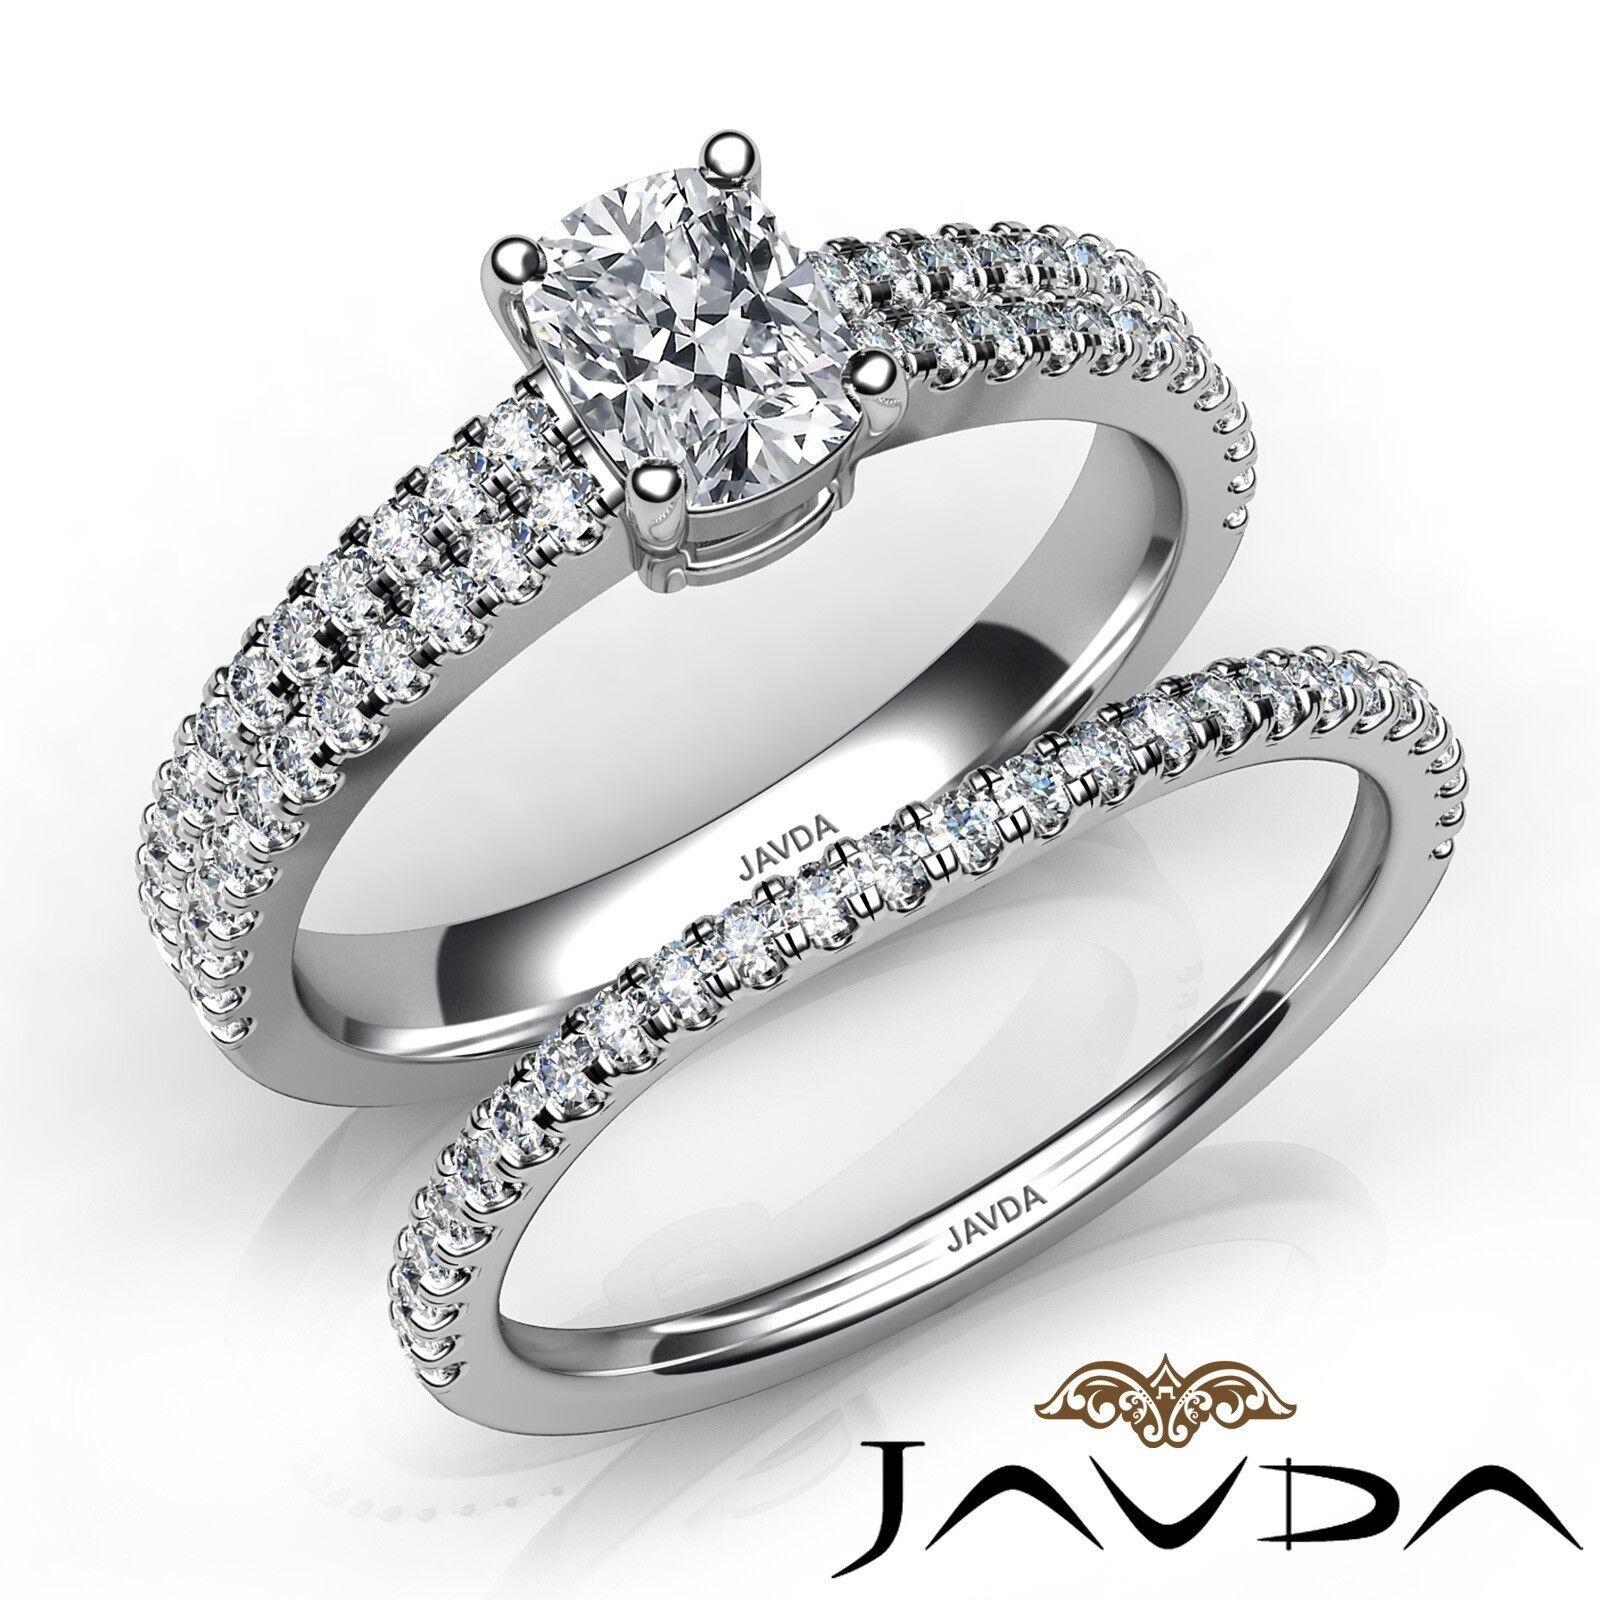 1.5ctw Bridal Scalloped Pave Cushion Diamond Engagement Ring GIA F-VVS2 W Gold